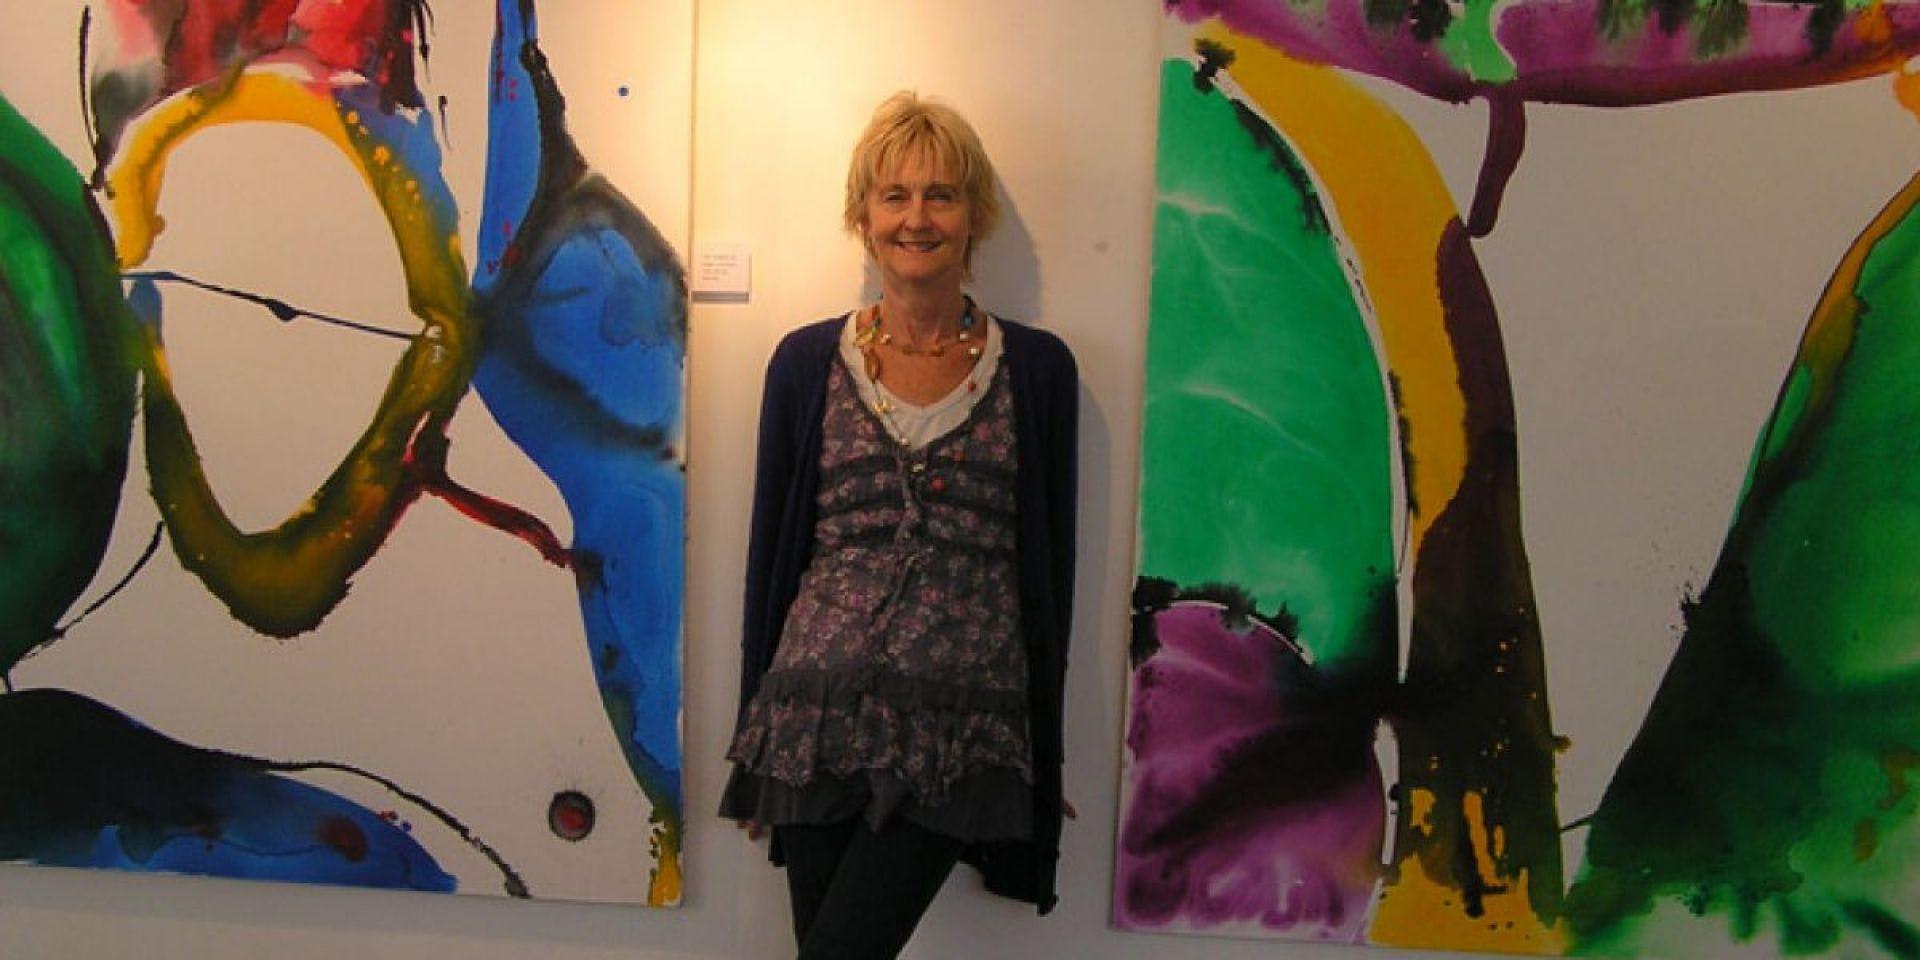 Sally Lister